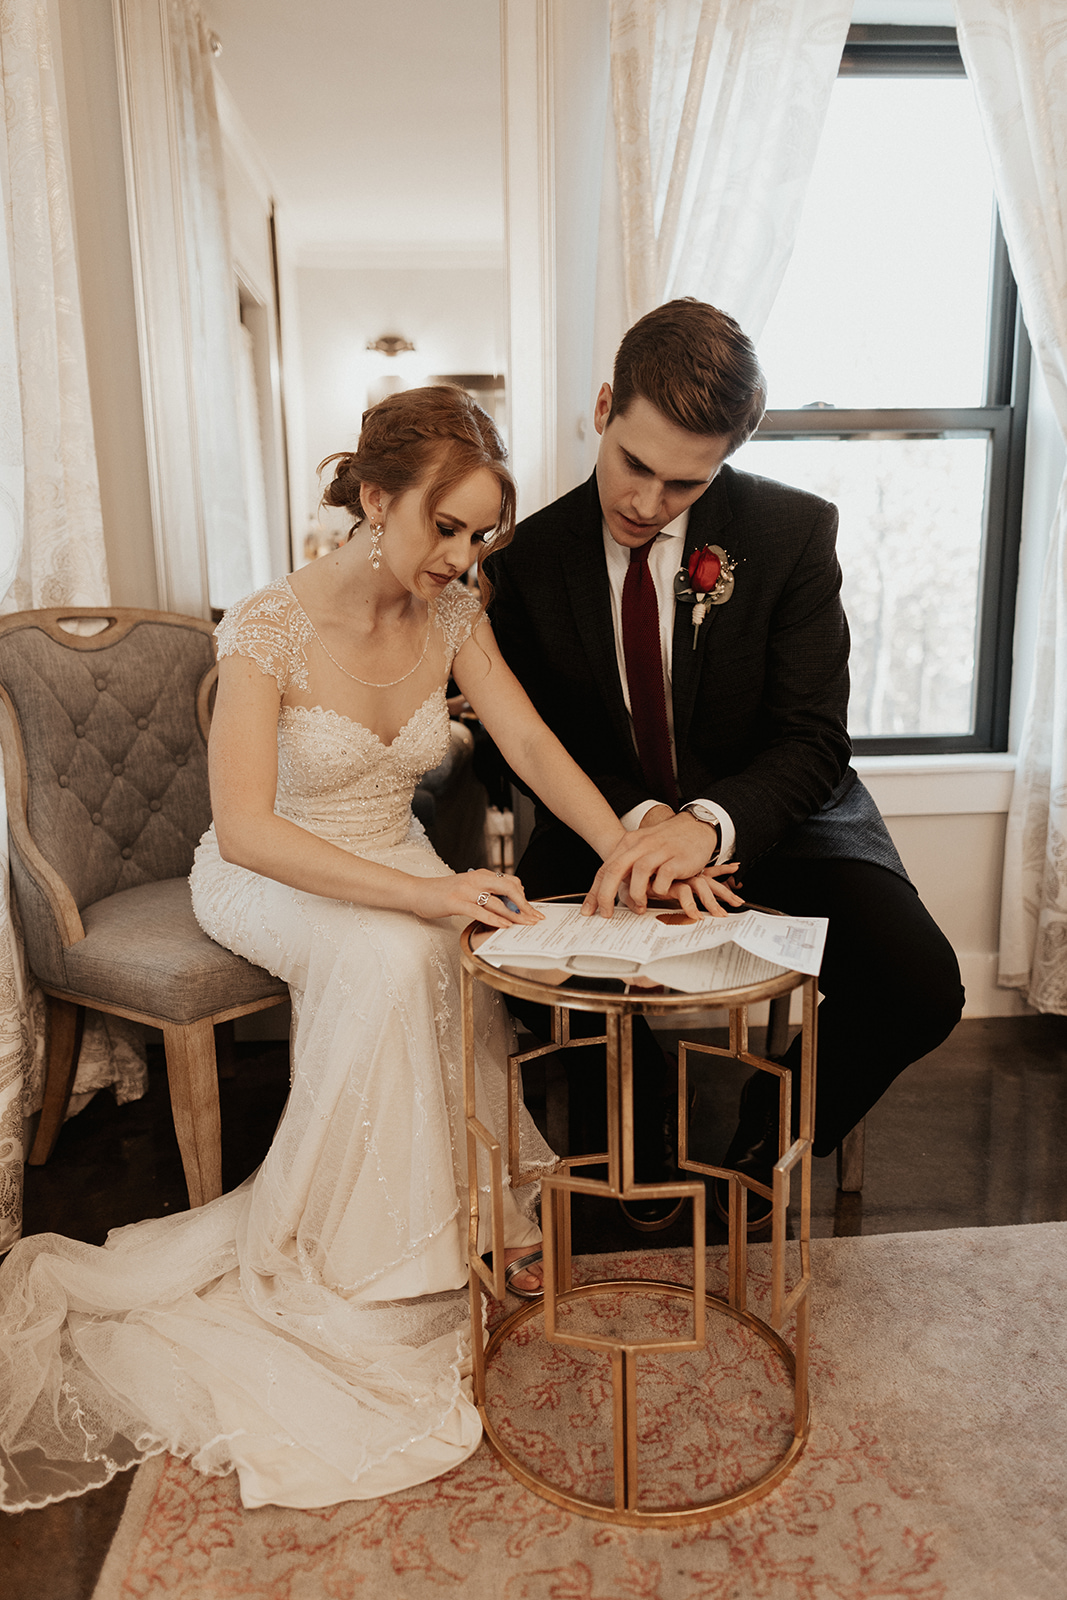 Best Wedding Venue in Tulsa Bixby Dream Point Ranch 57.jpg